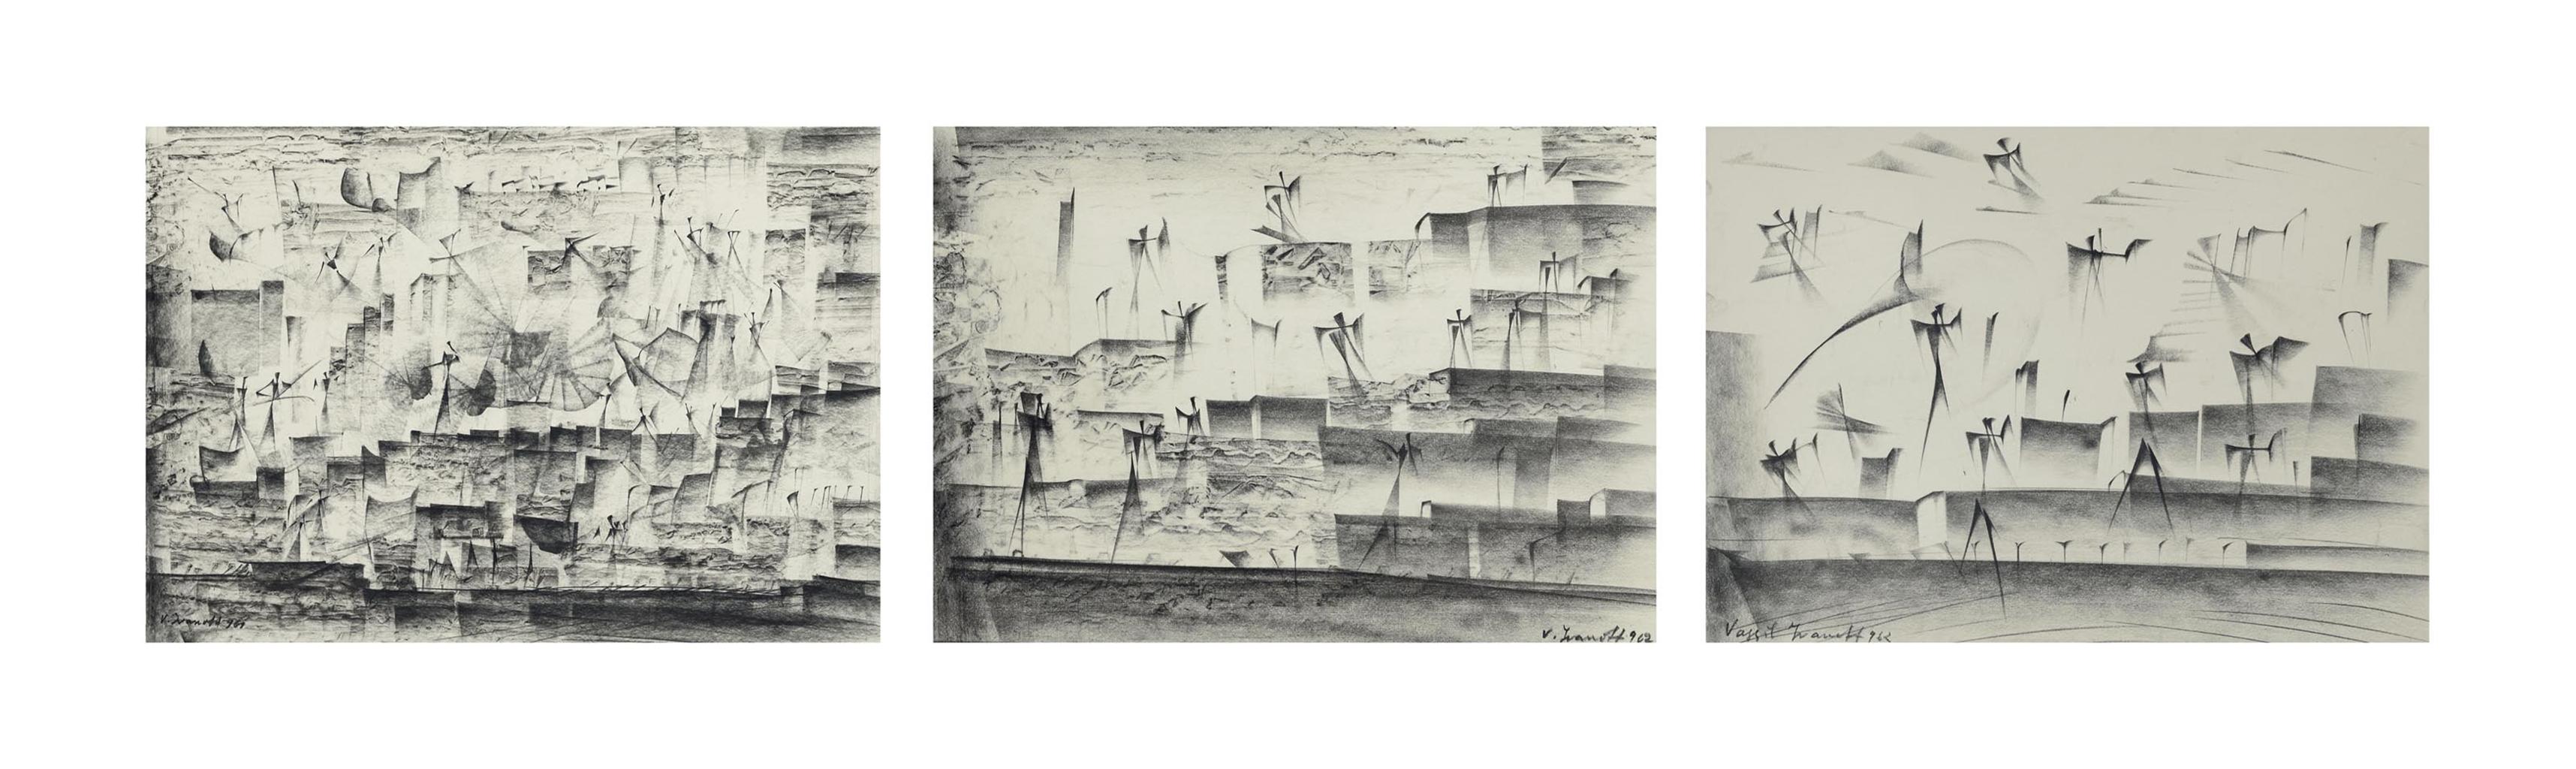 Vassil Ivanoff-Compositions surrealistes-1962